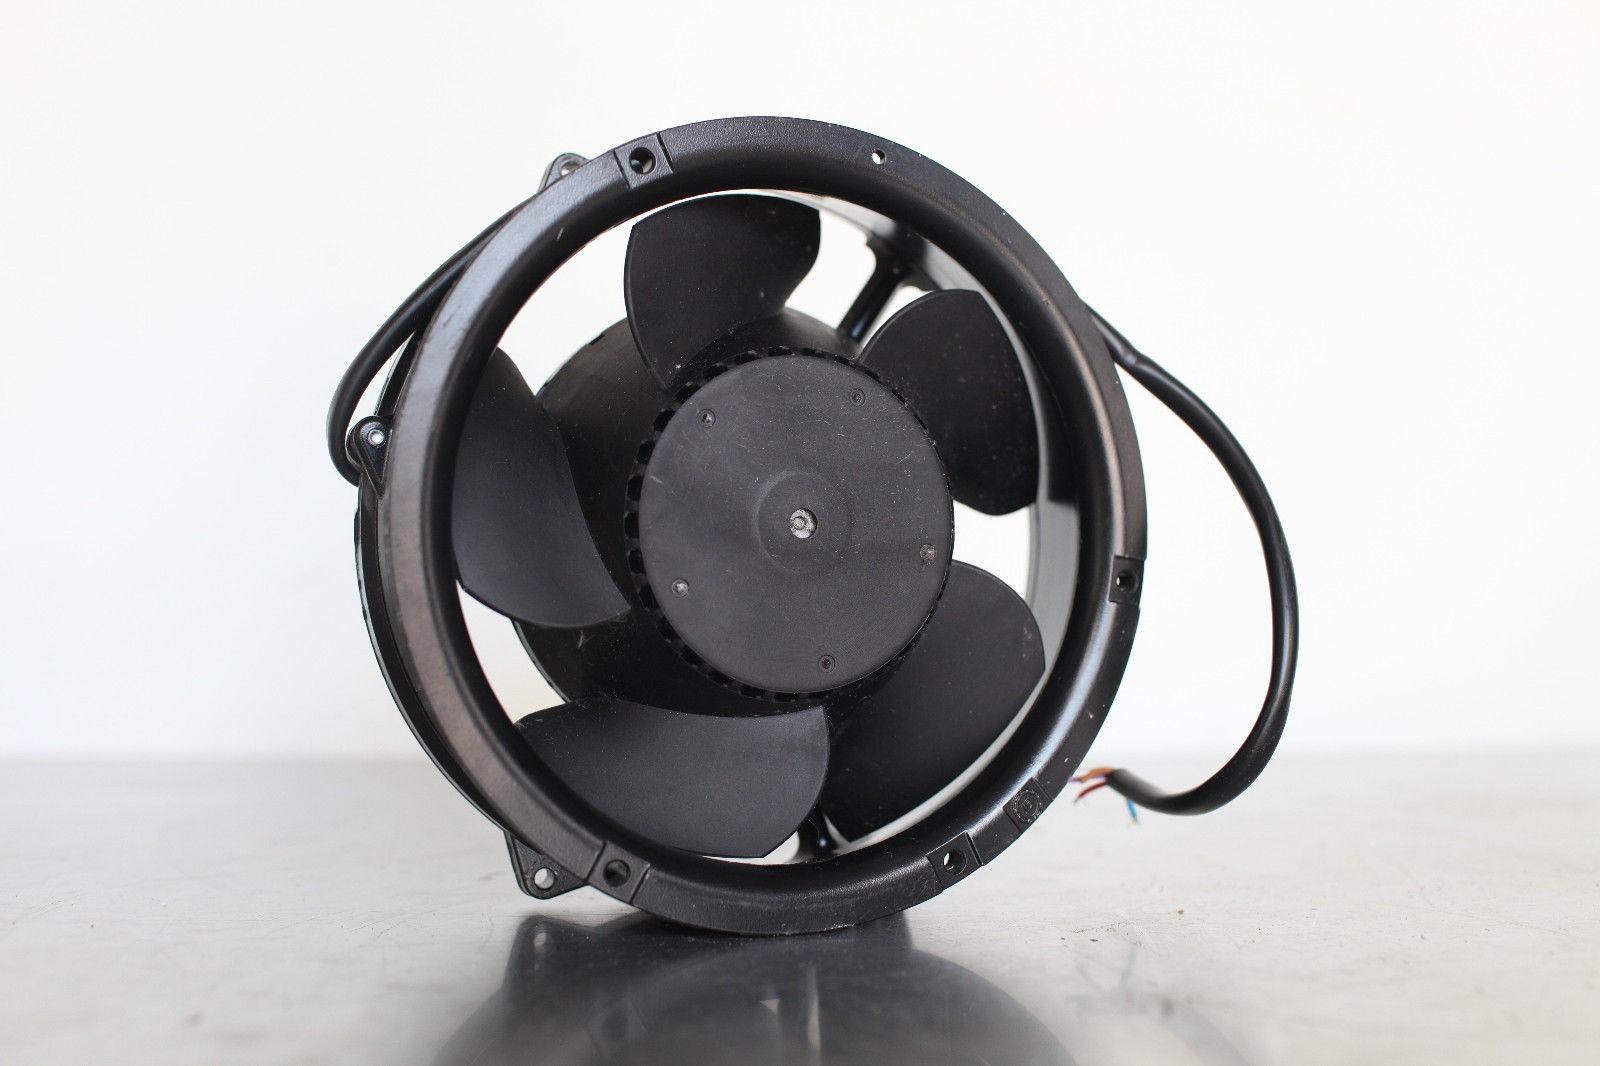 EBM Papst DV621212 VDC 2A 32W w/ Tachometer  Vario-Pro Case Cooling Fan